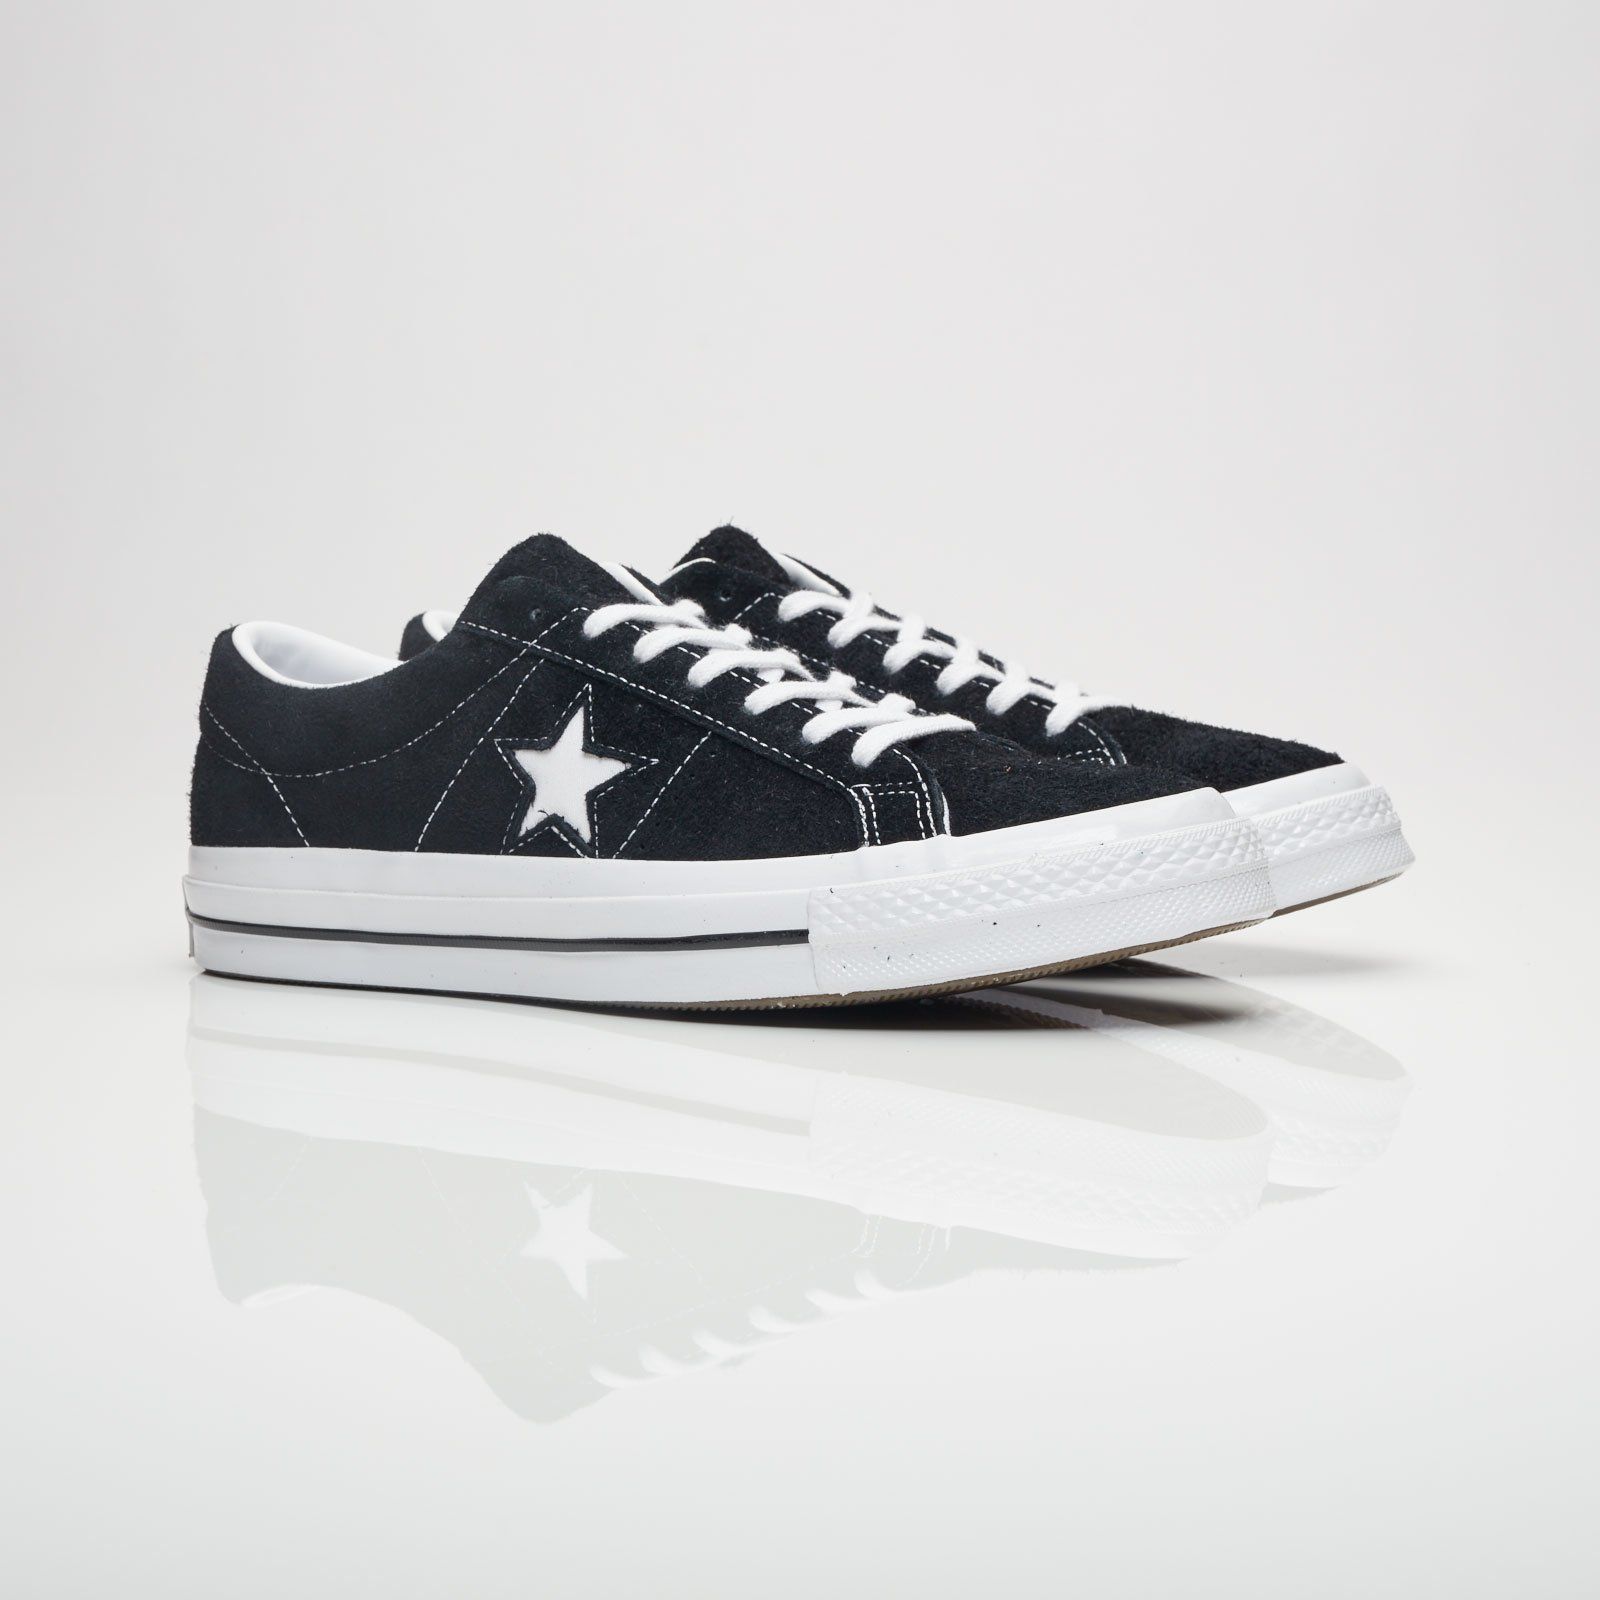 874ad98f6ecc Converse One Star Ox - 158369c - Sneakersnstuff